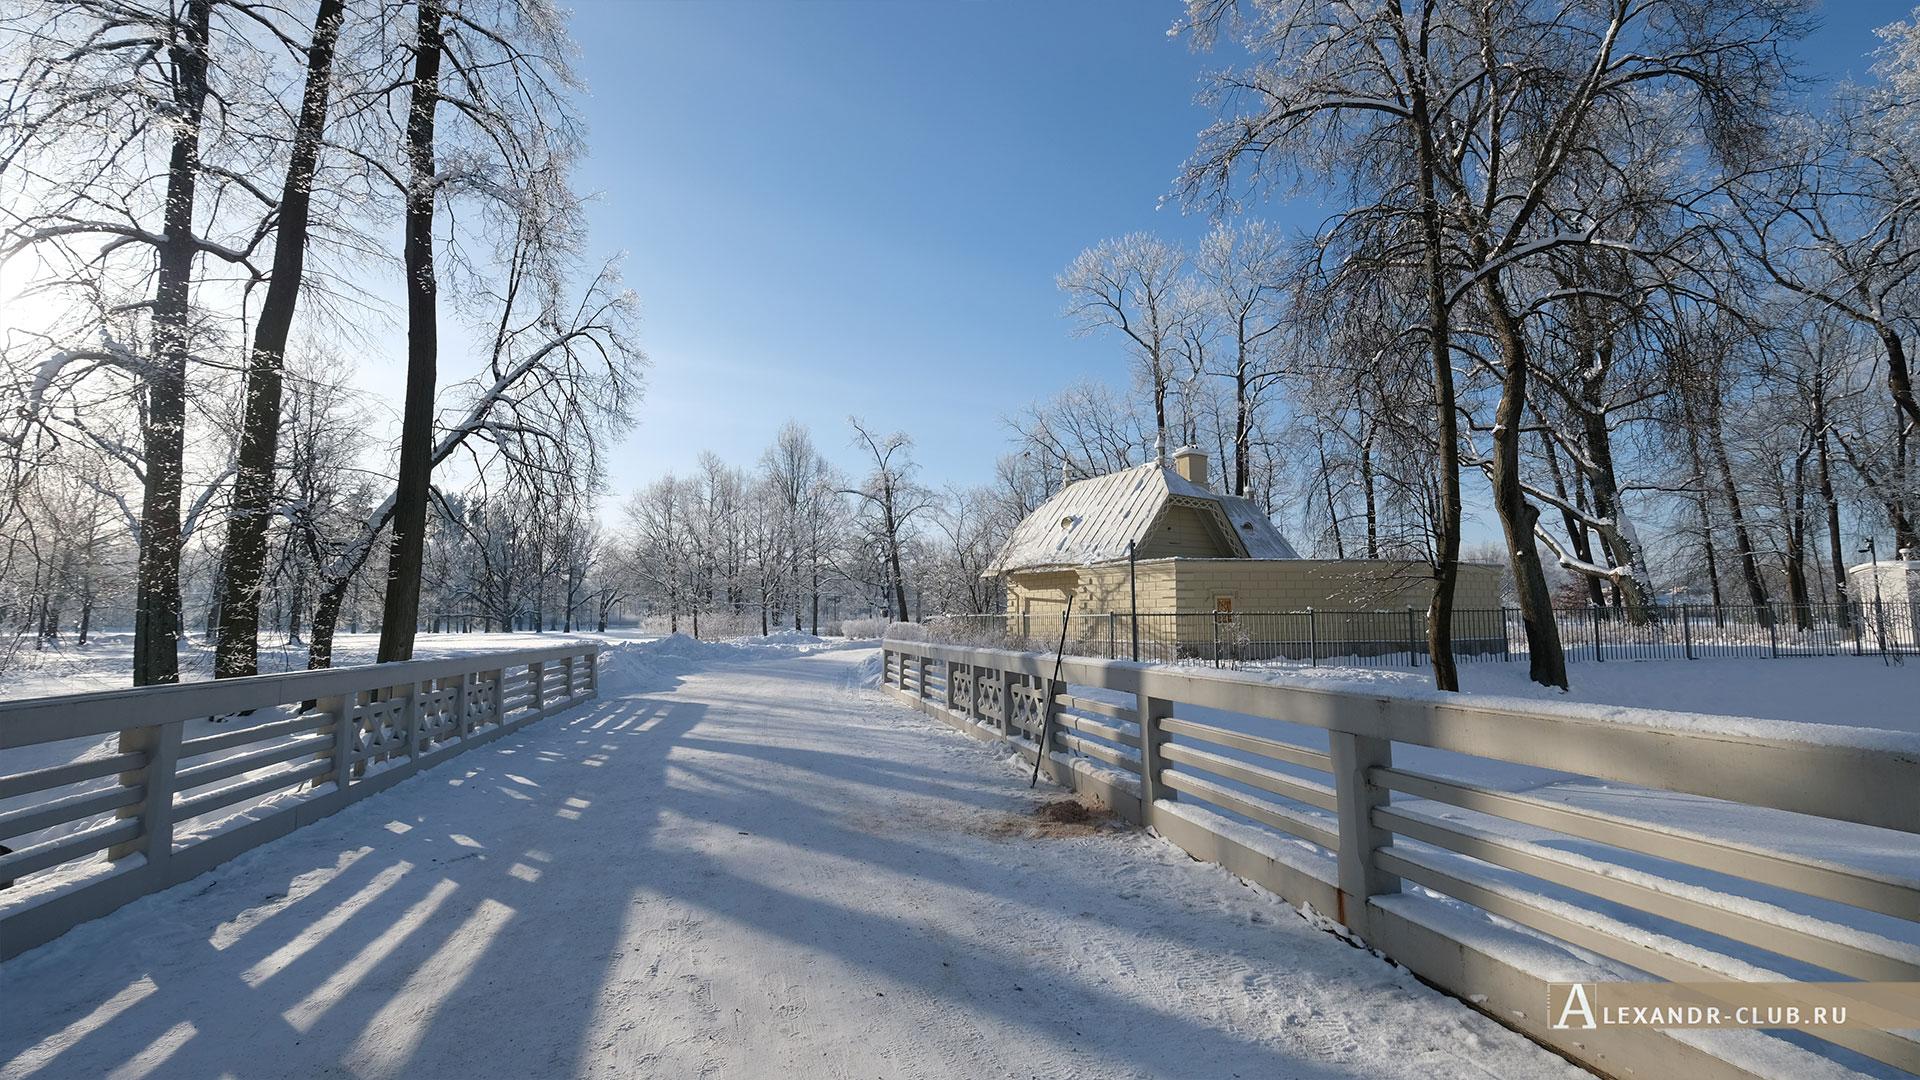 Петергоф, зима, парк «Александрия», Фельдъегерский домик